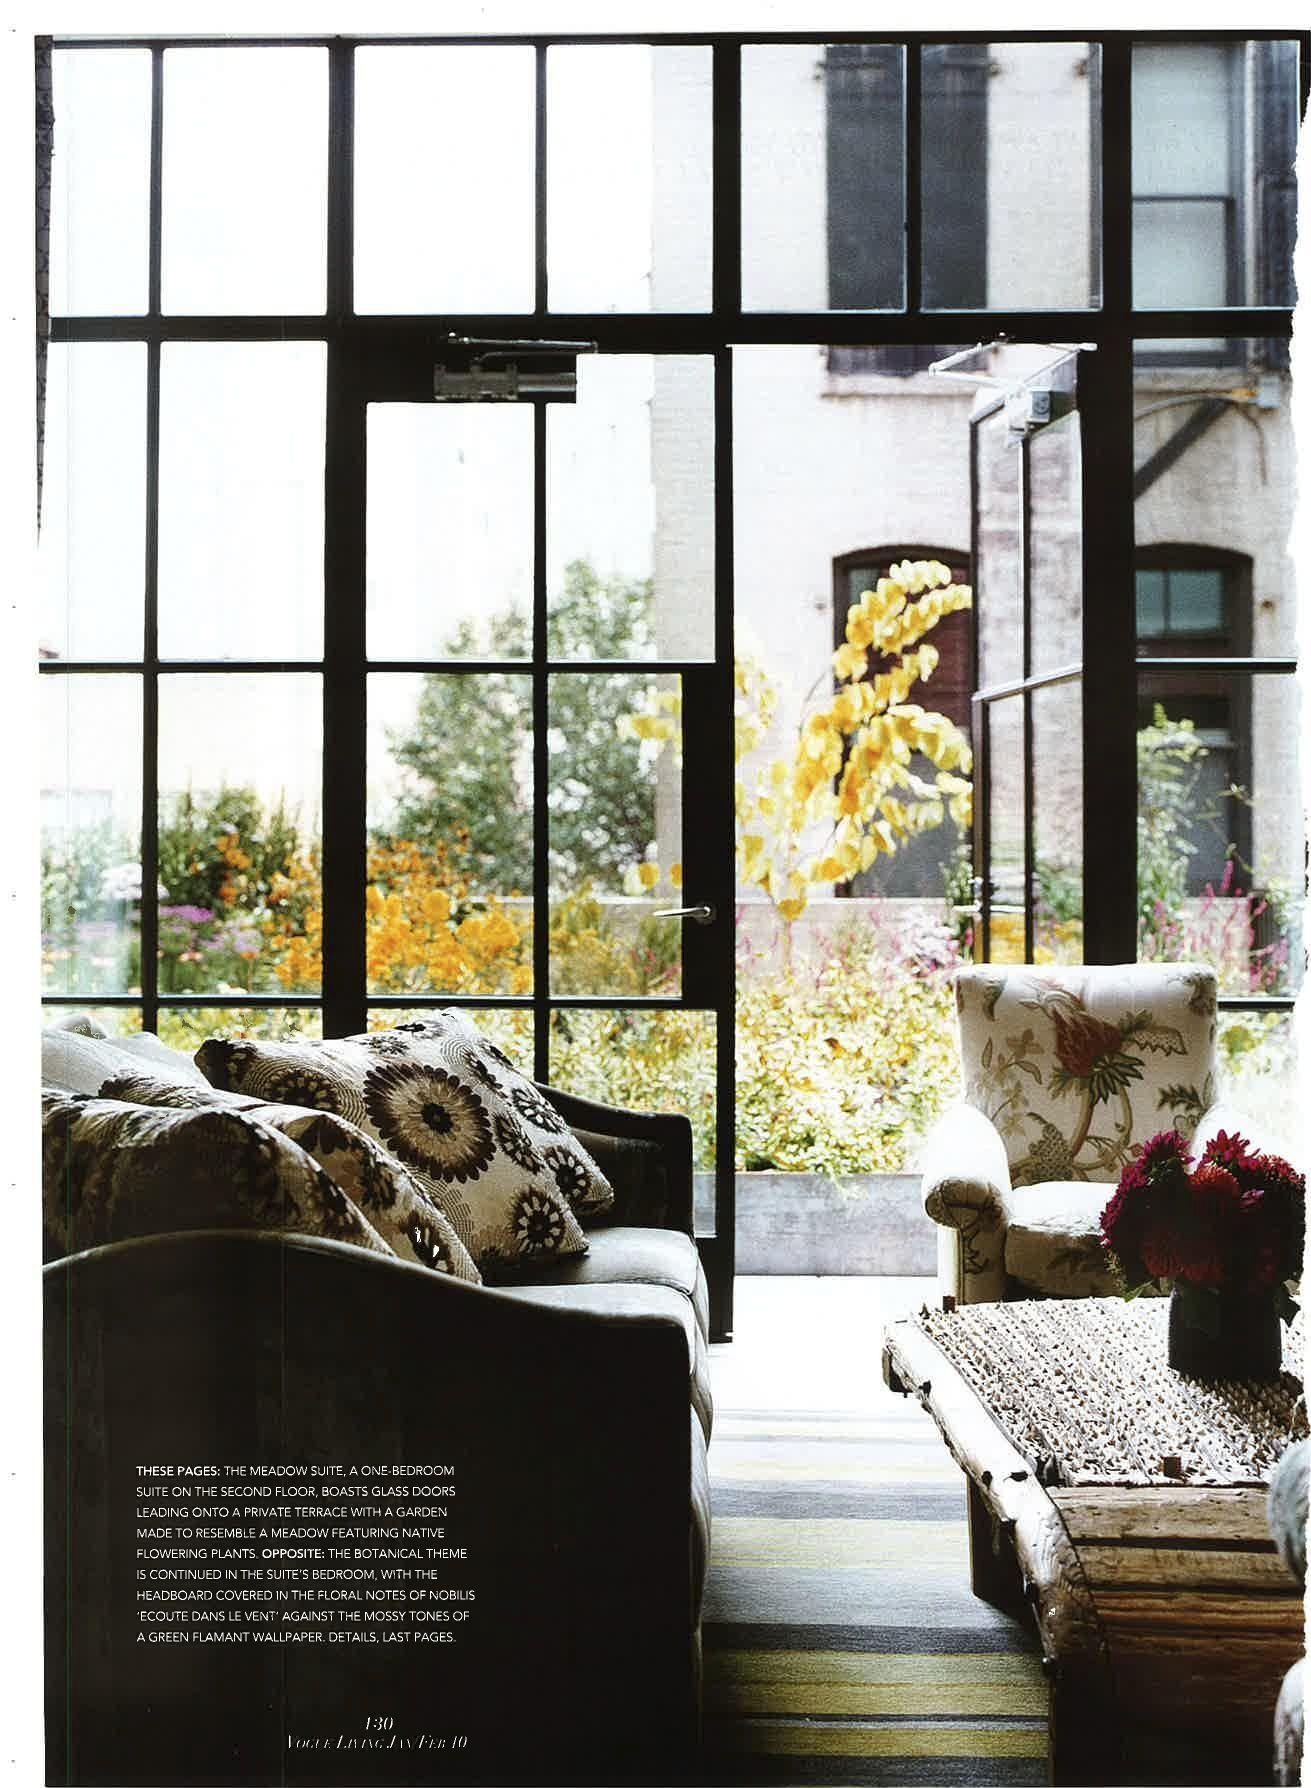 Steel frame windows and doors - Source